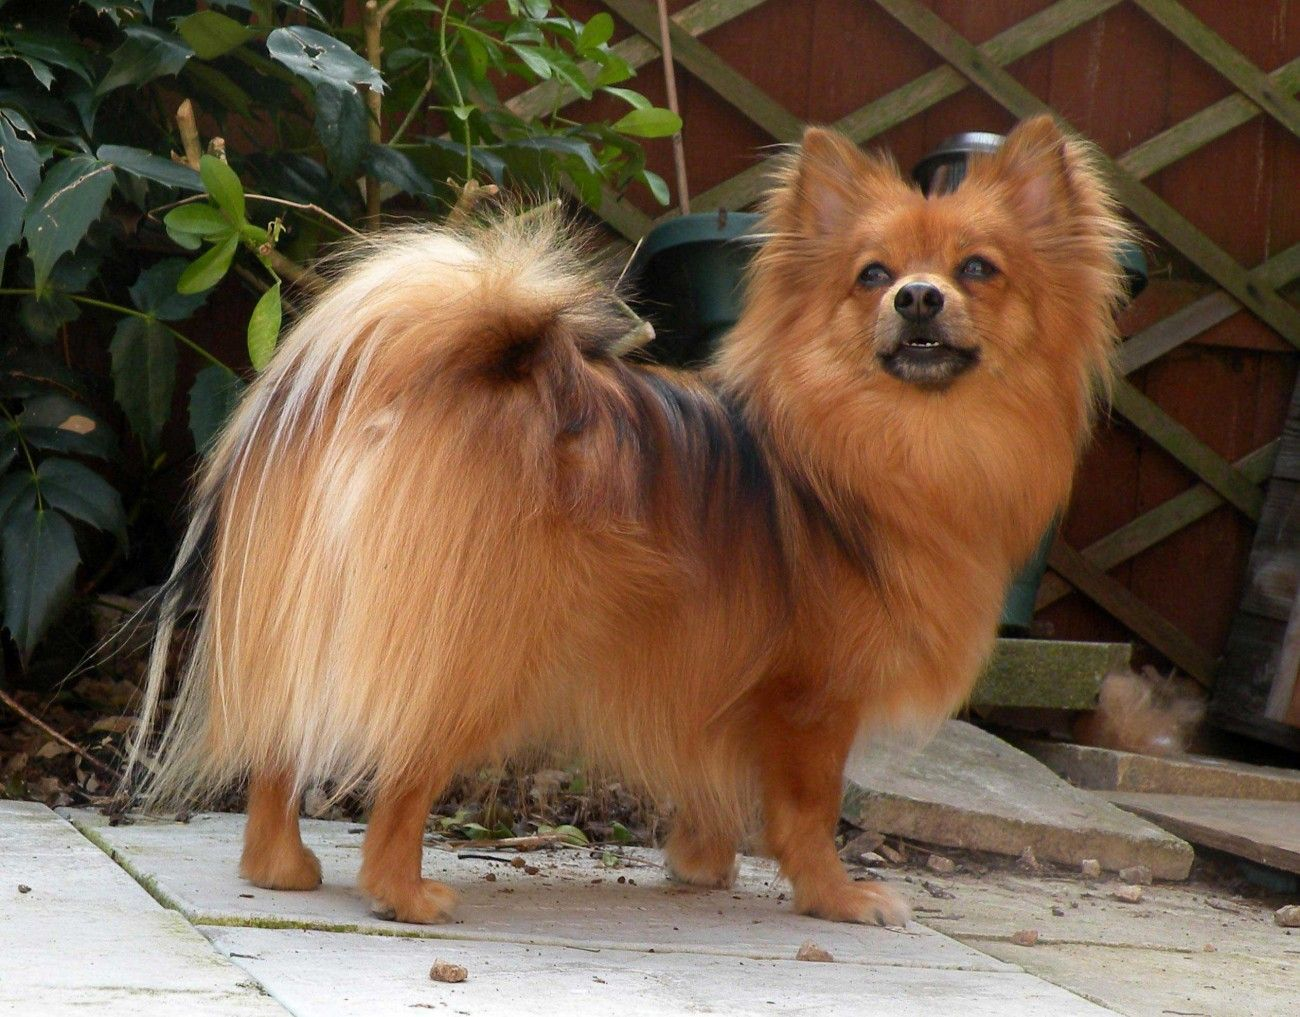 Amazing Pomeranian Brown Adorable Dog - 7ba32c06cf3c4e975a67fc3054380c4c  2018_292085  .jpg